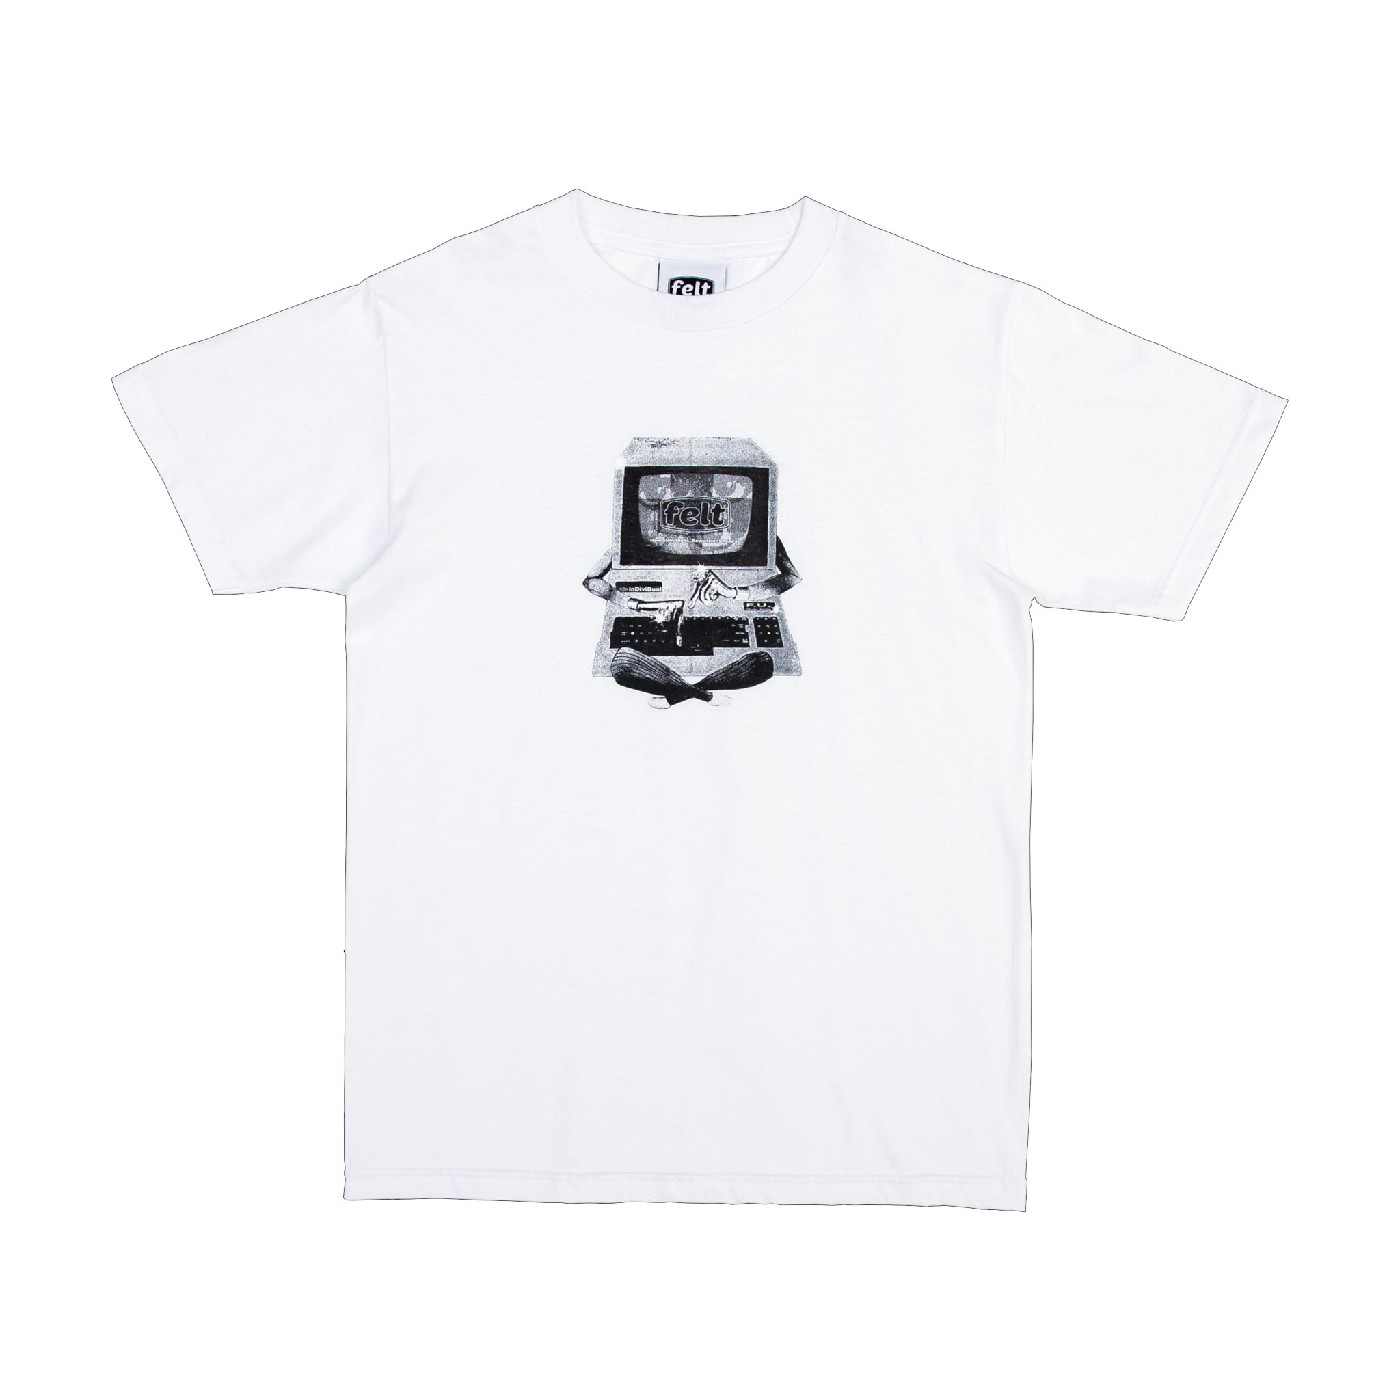 【FELT/フェルト】DIAL UP T-SHIRT Tシャツ / WHT